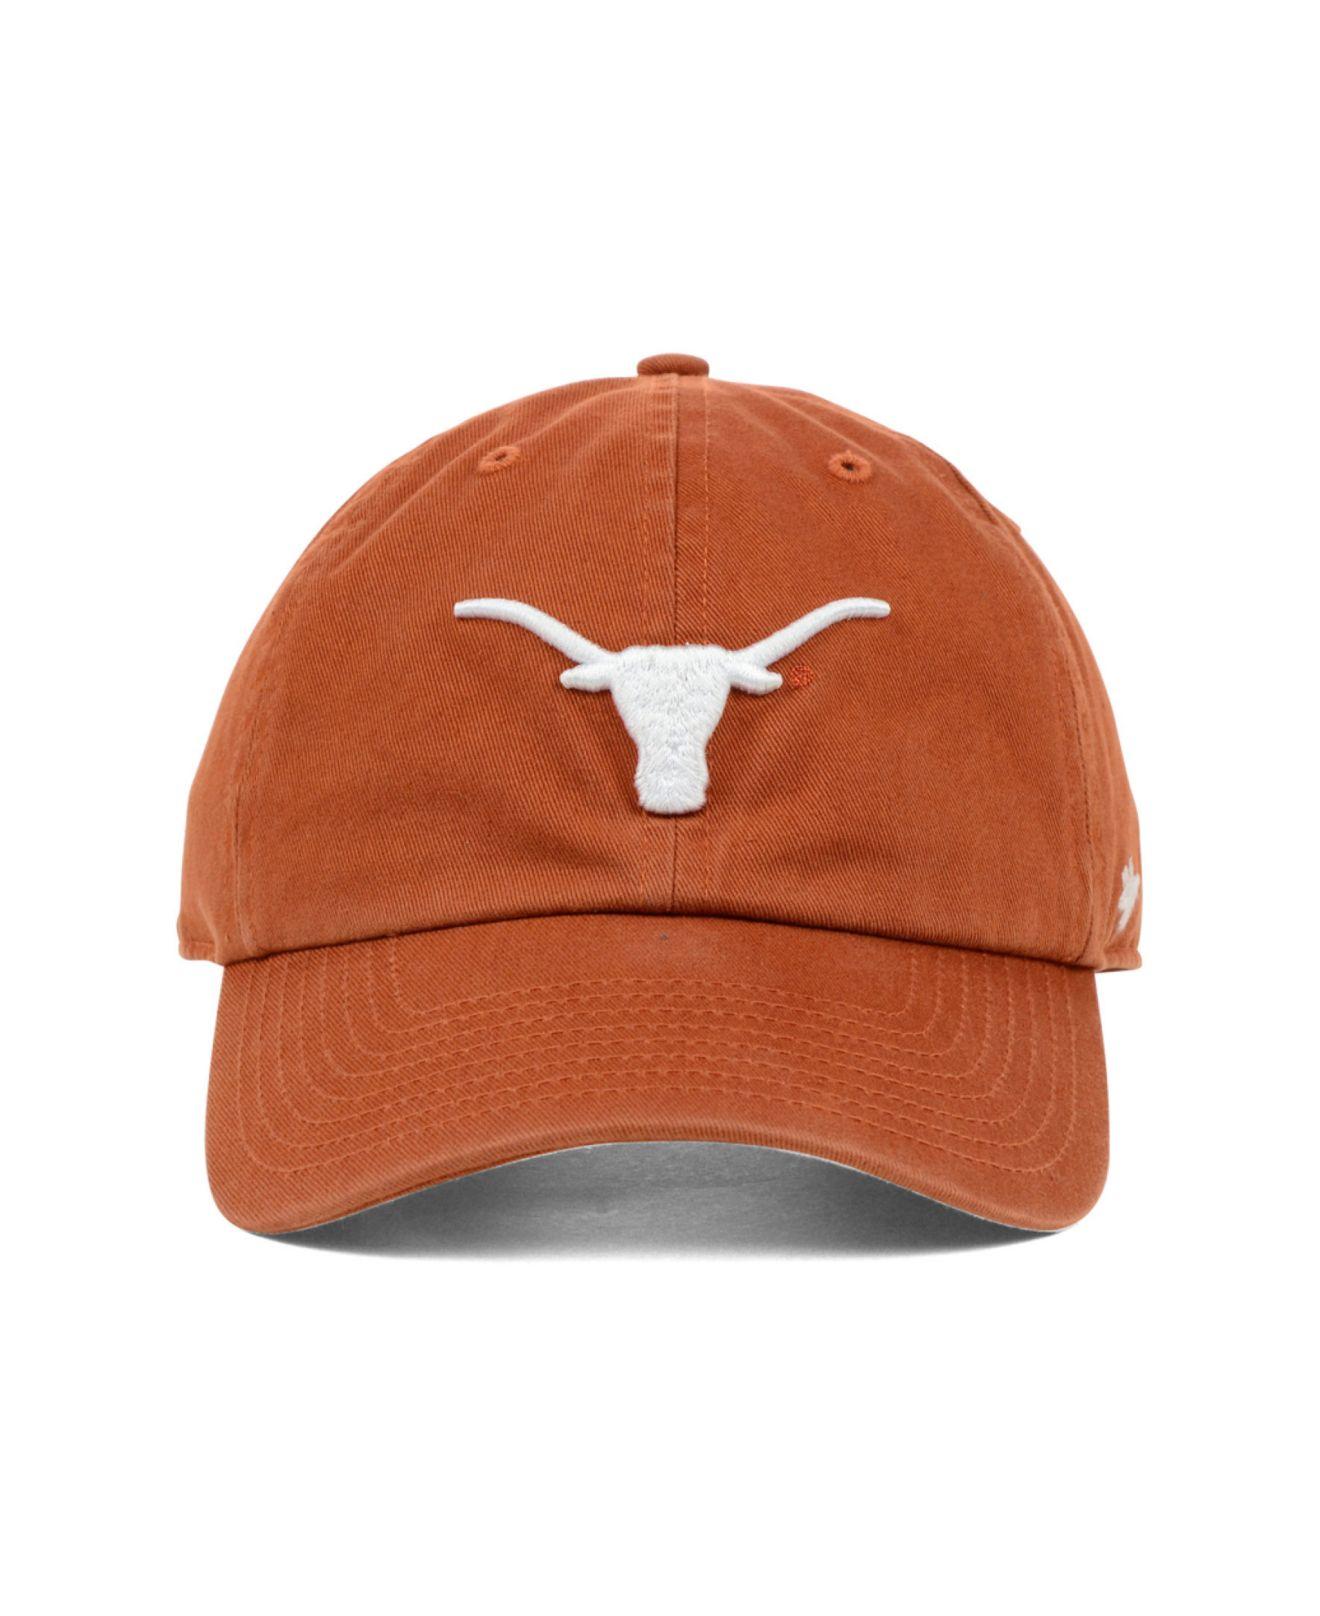 d820a674f06e2 47 Brand Texas Longhorns Clean-up Cap in Orange for Men - Lyst